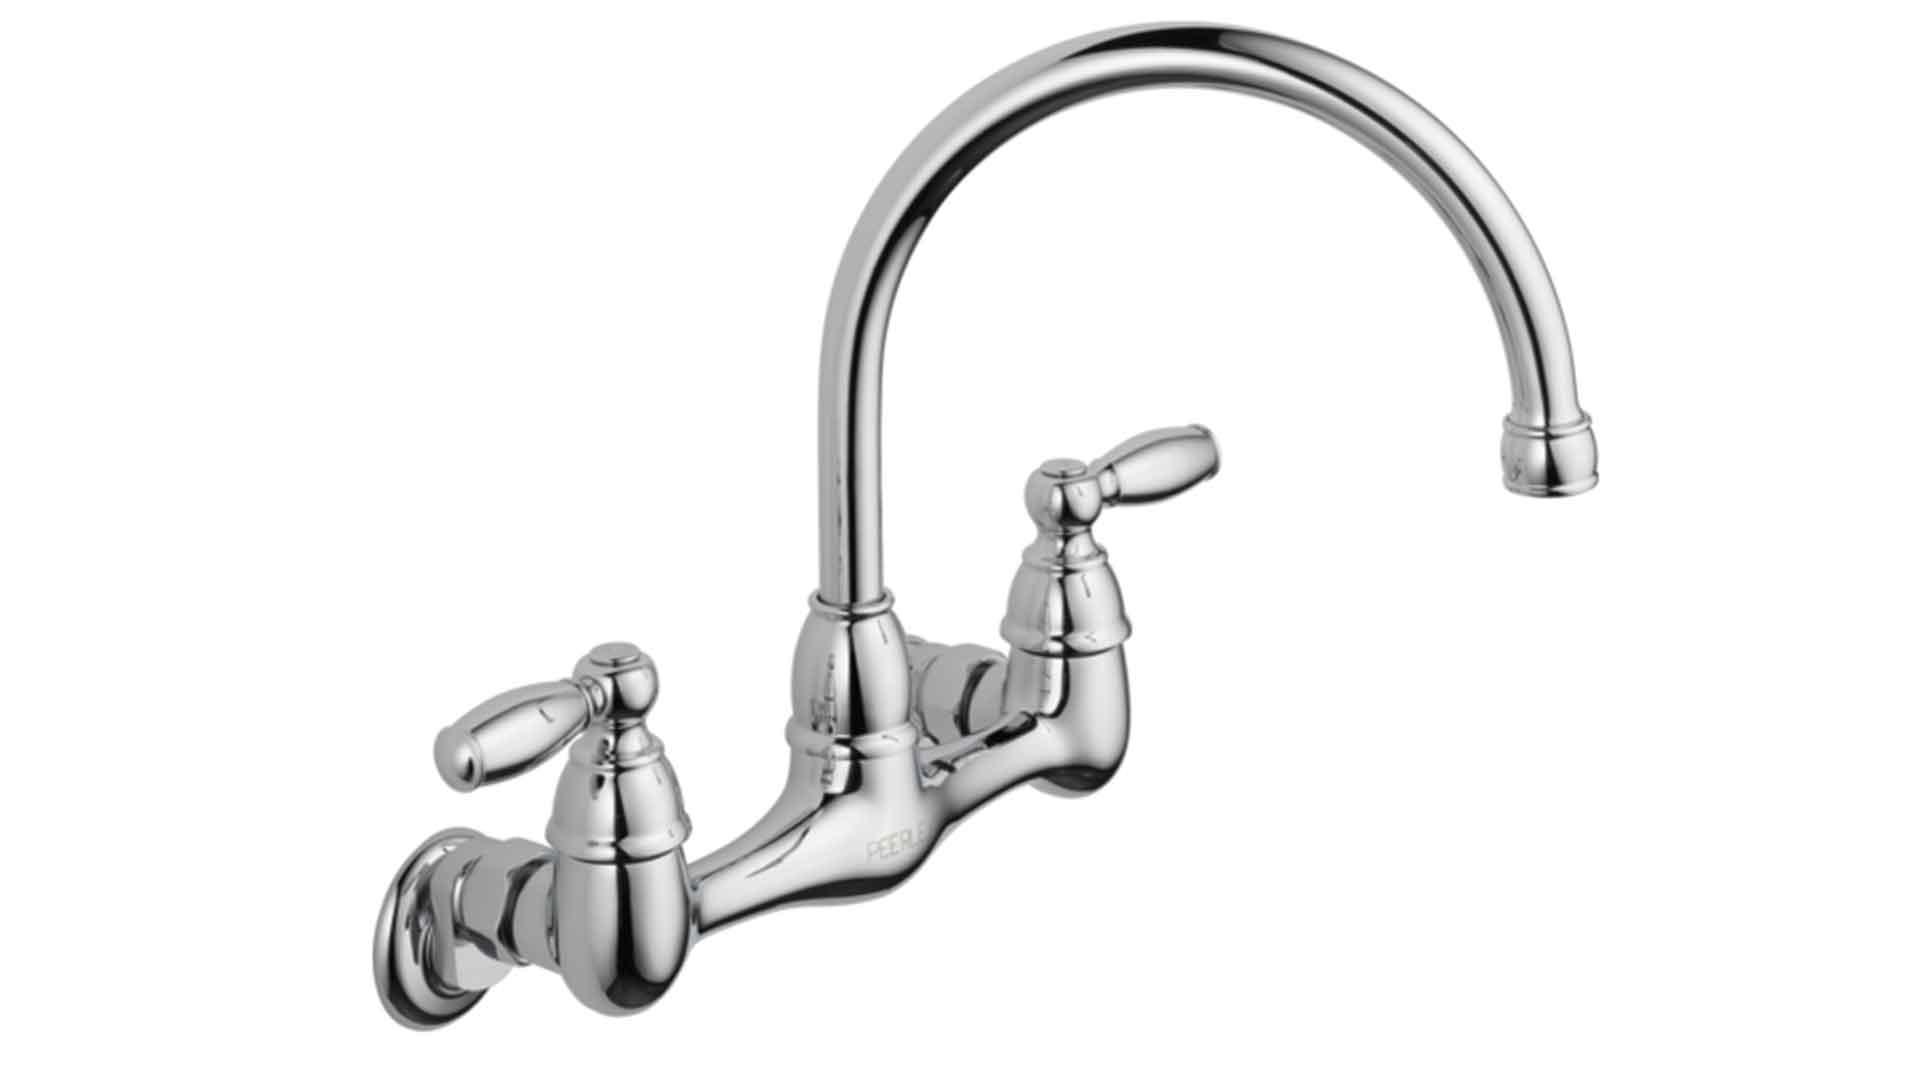 Peerless Two Handle Faucets